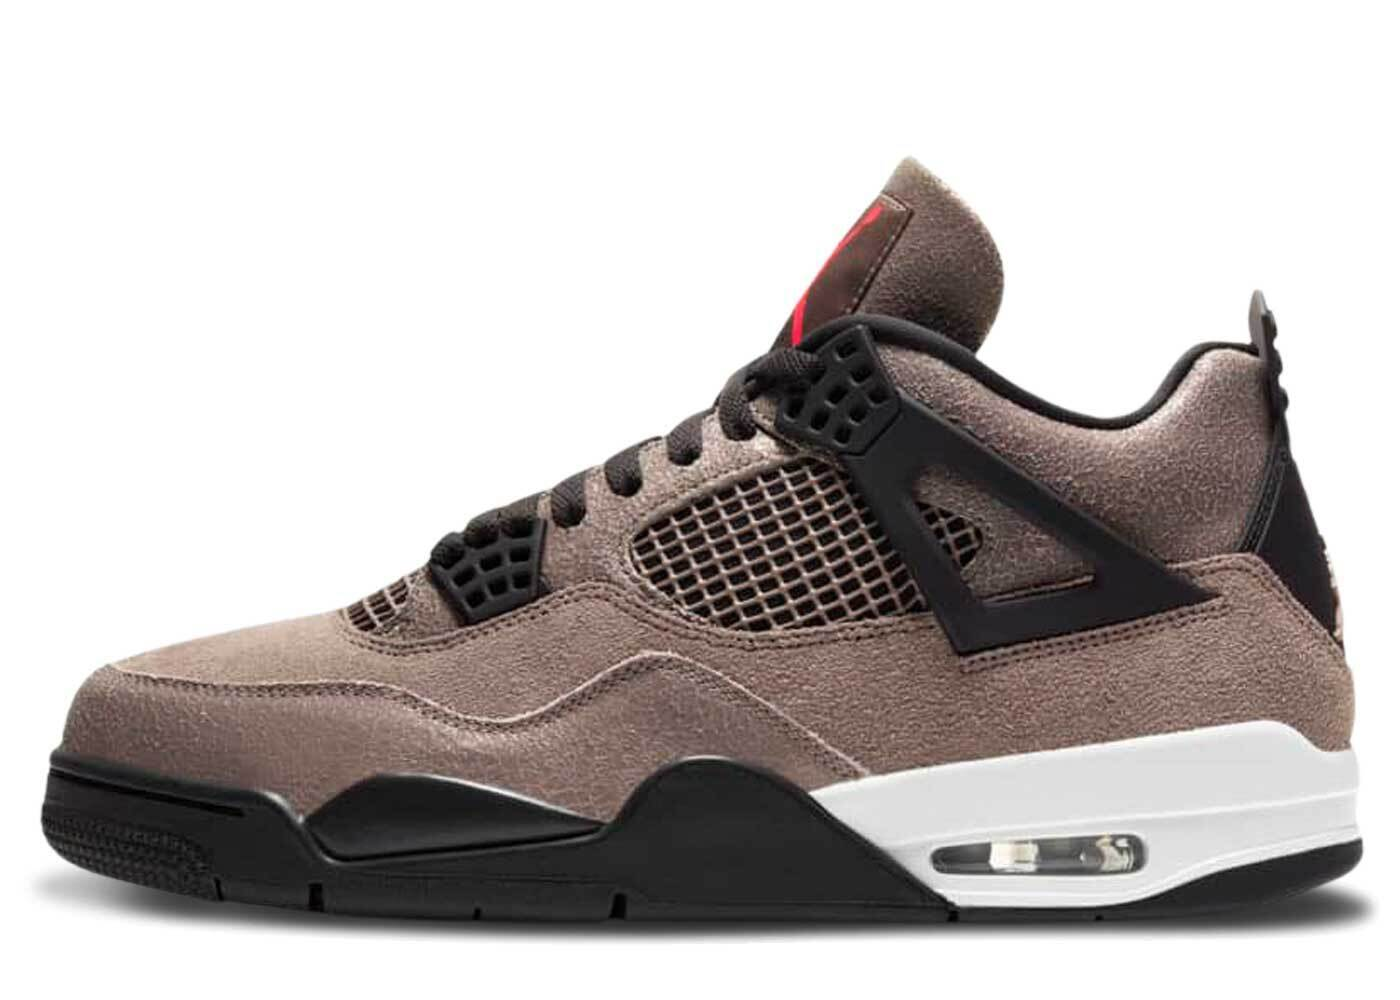 Nike Air Jordan 4 Retro Taupe Hazeの写真